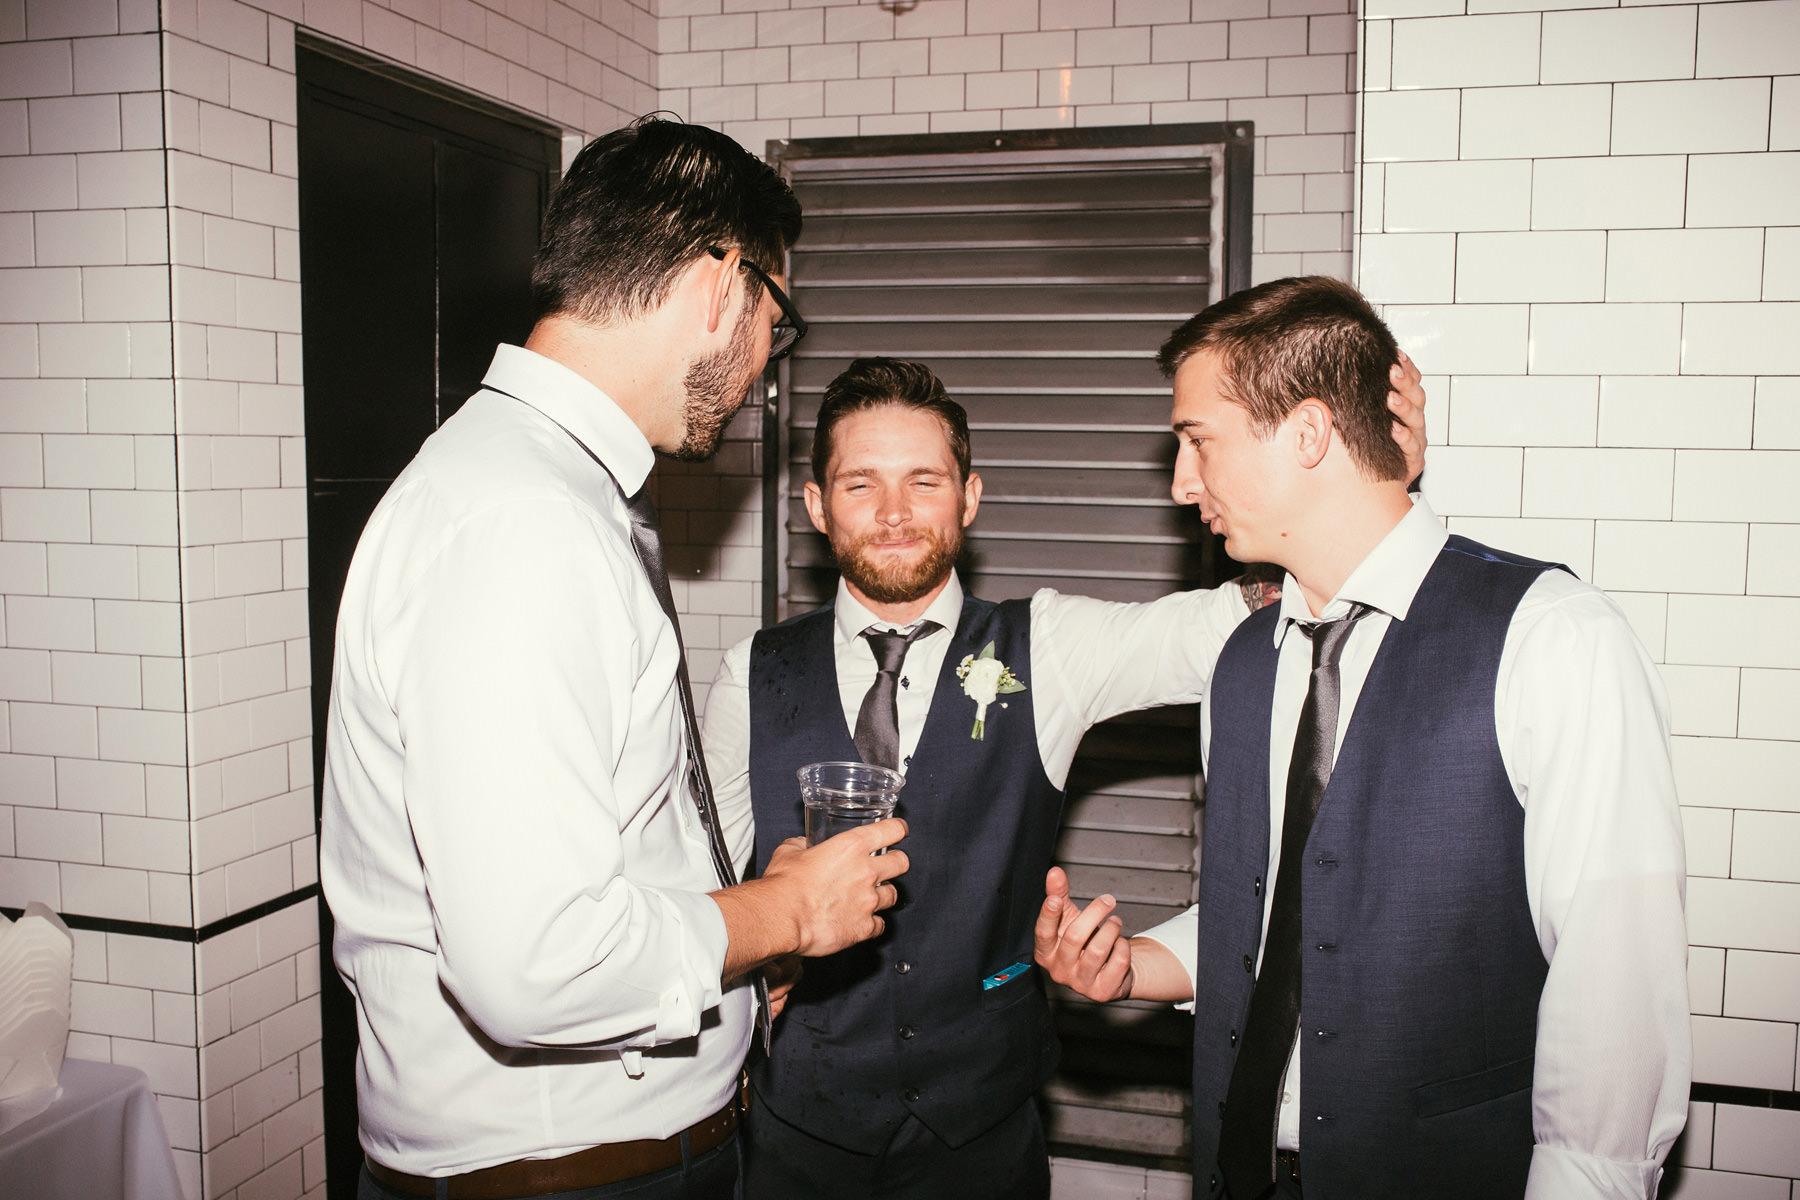 Kansas City Summer Wedding at the Guild_Kindling Wedding Photography Blog109.JPG